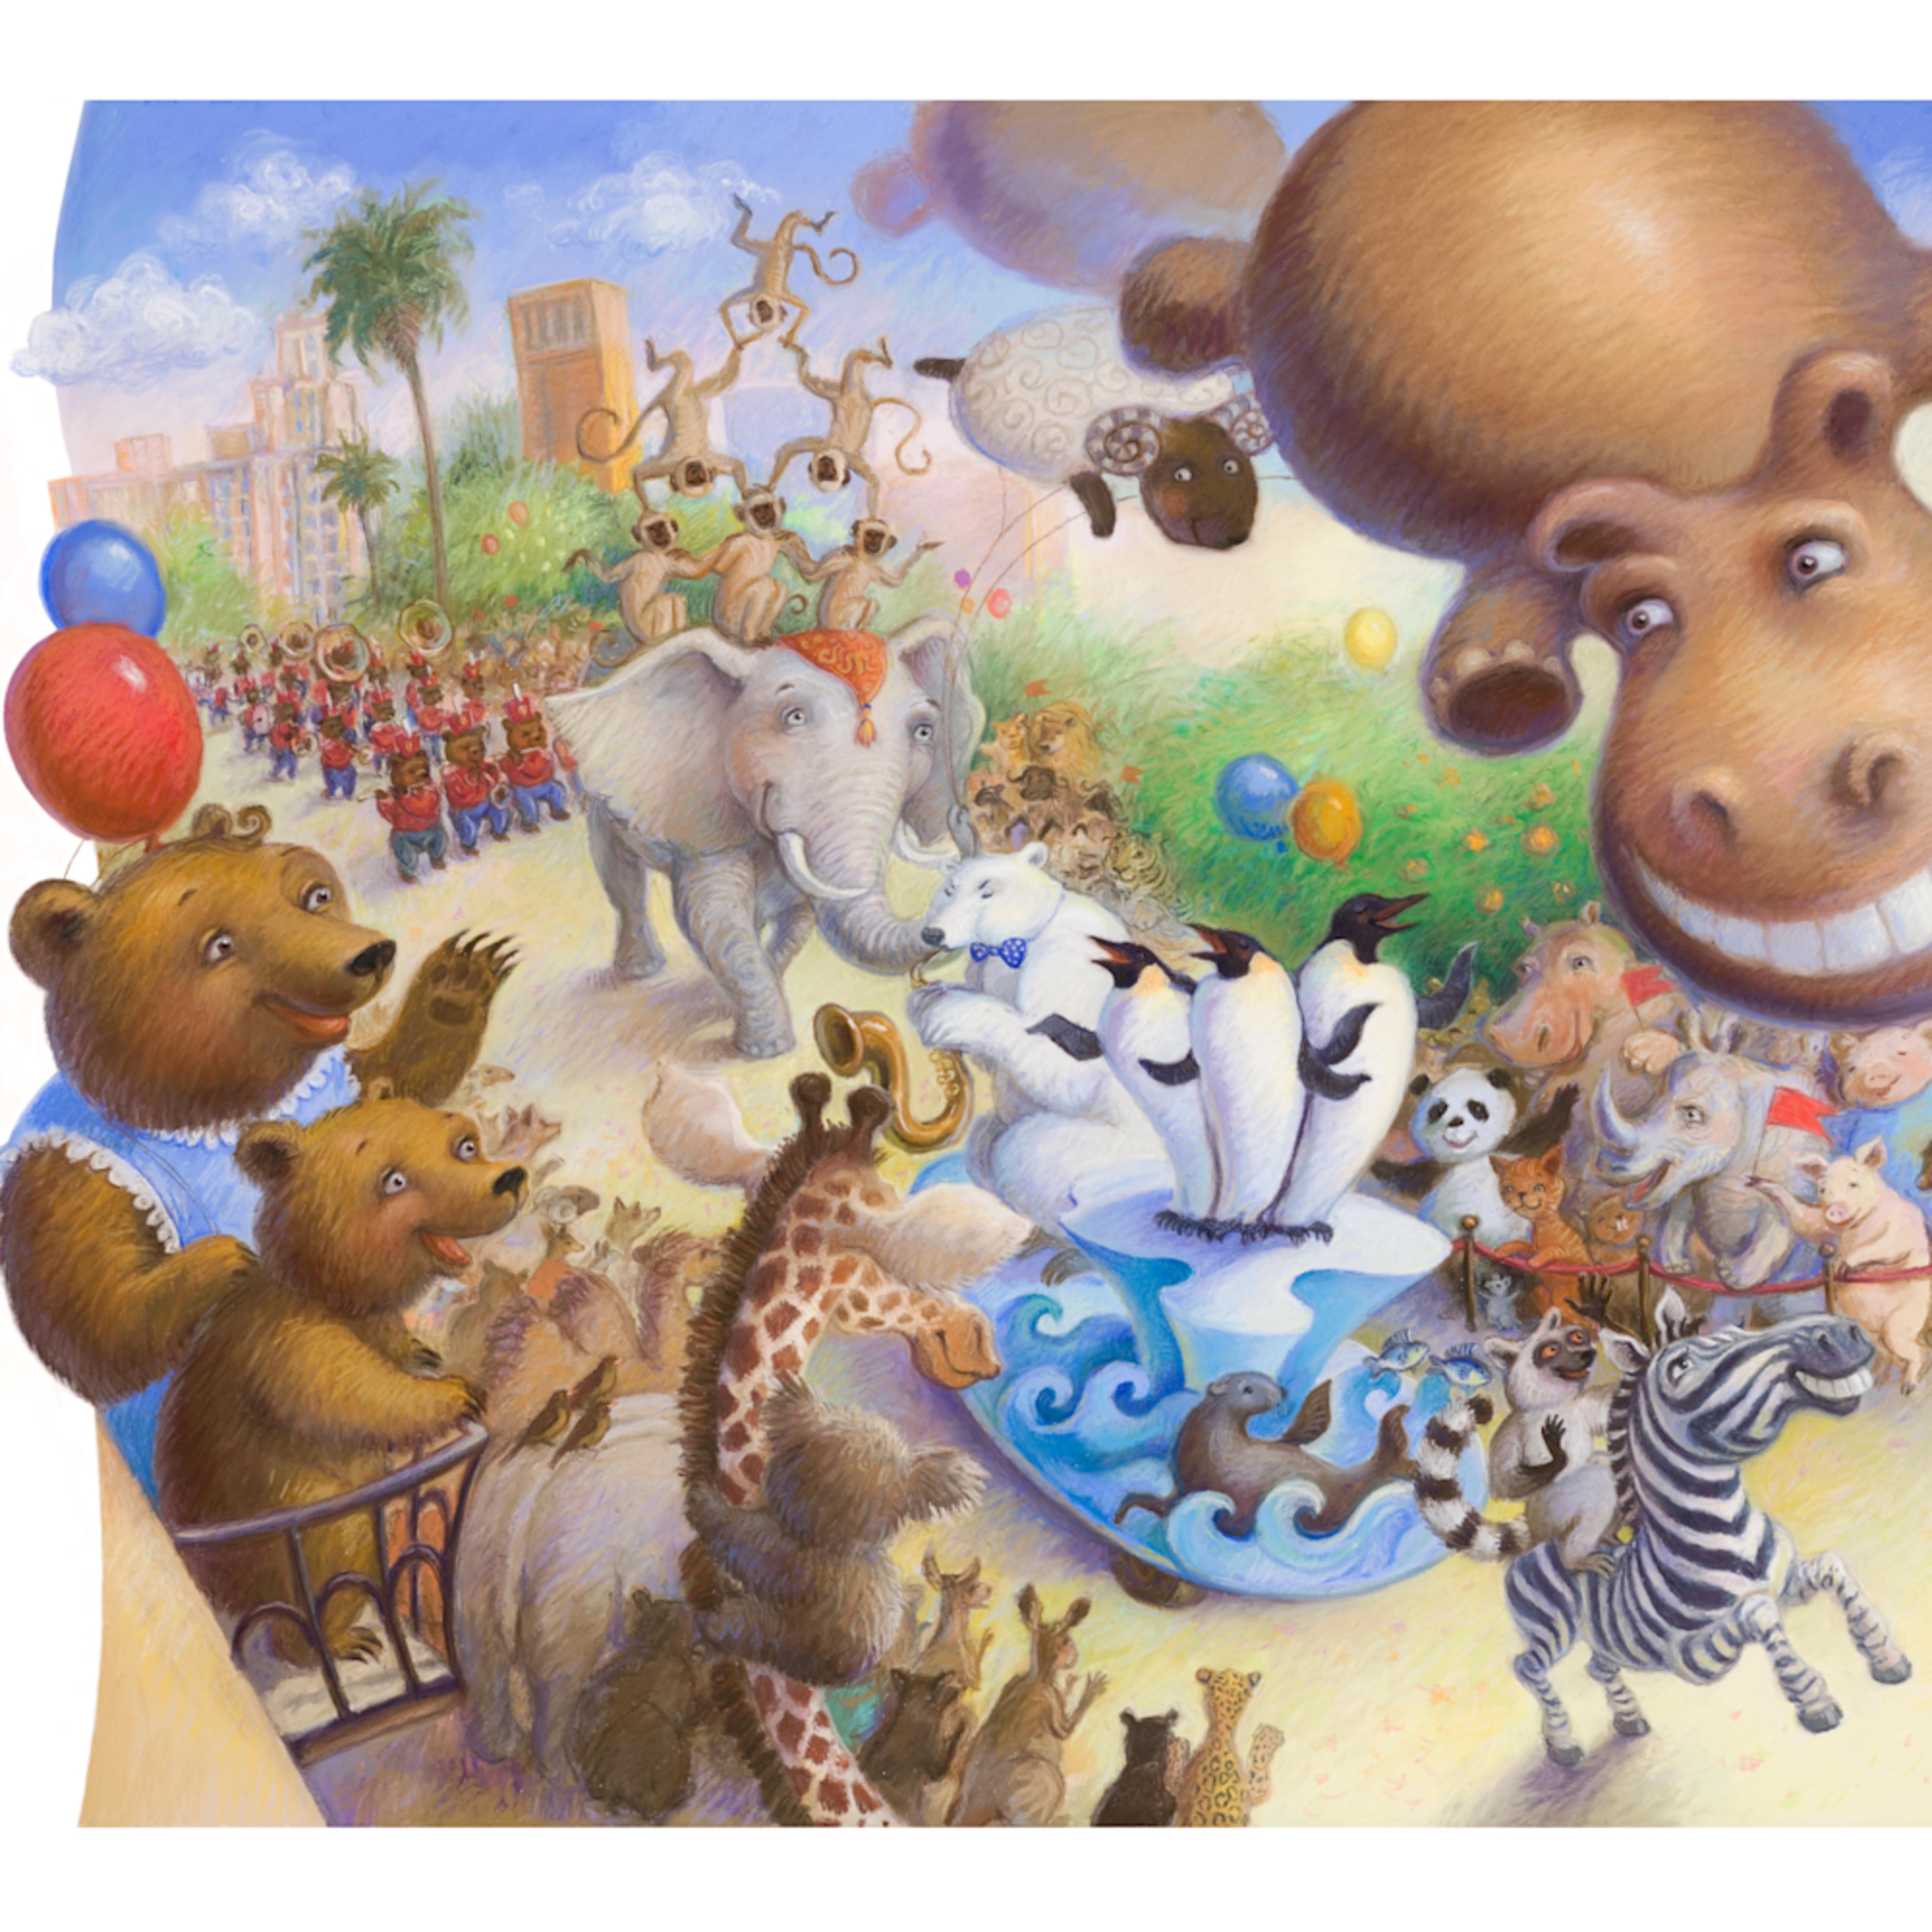 New animal parade lyuba bogan 23x19 crop qwlpcb